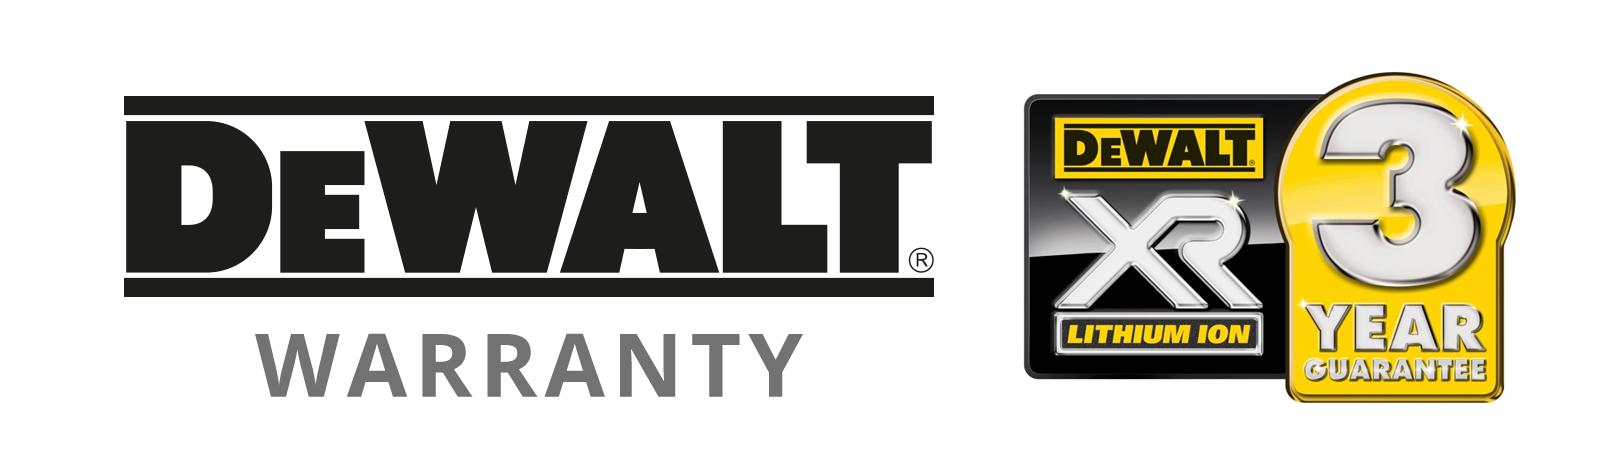 dewalt-warranty.png